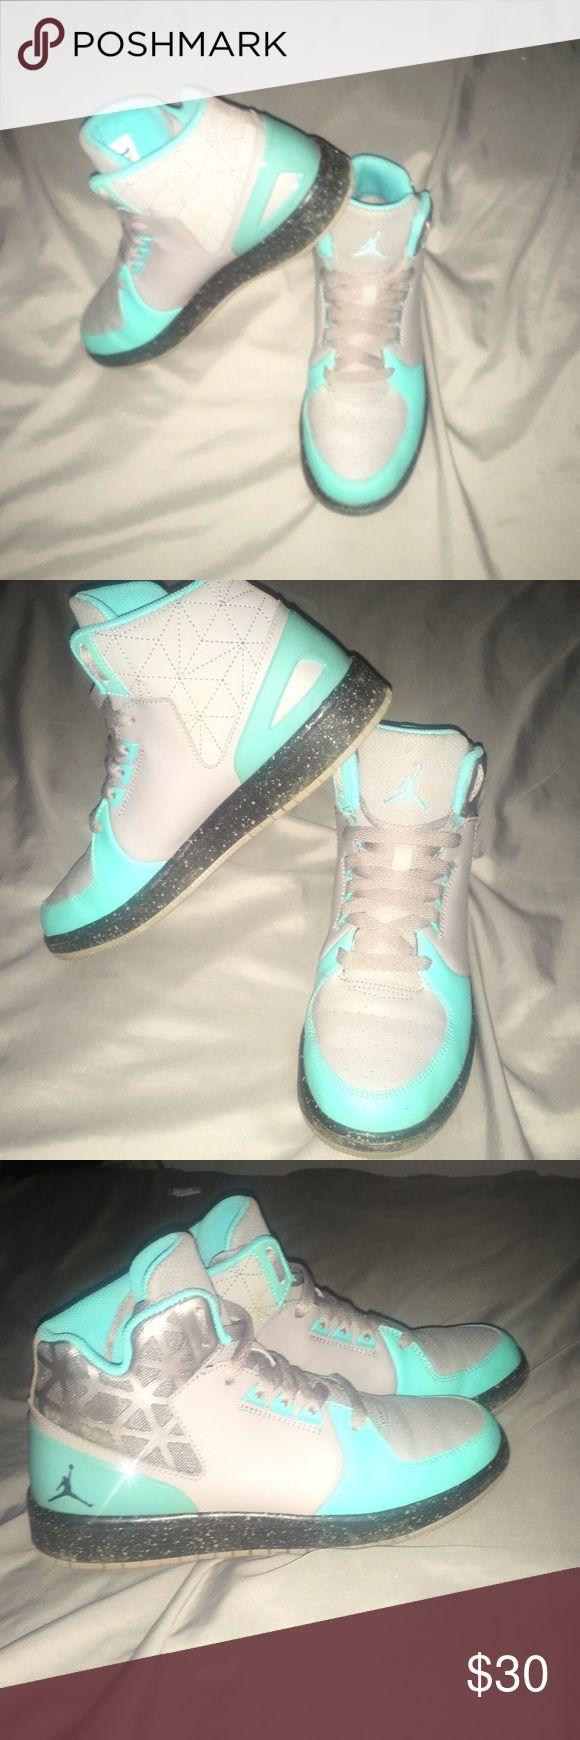 Kids Basketball shoes 6 Youth / High Top/ Jordan Basketball shoe/ teal and gray color/ Jordan Shoes Sneakers